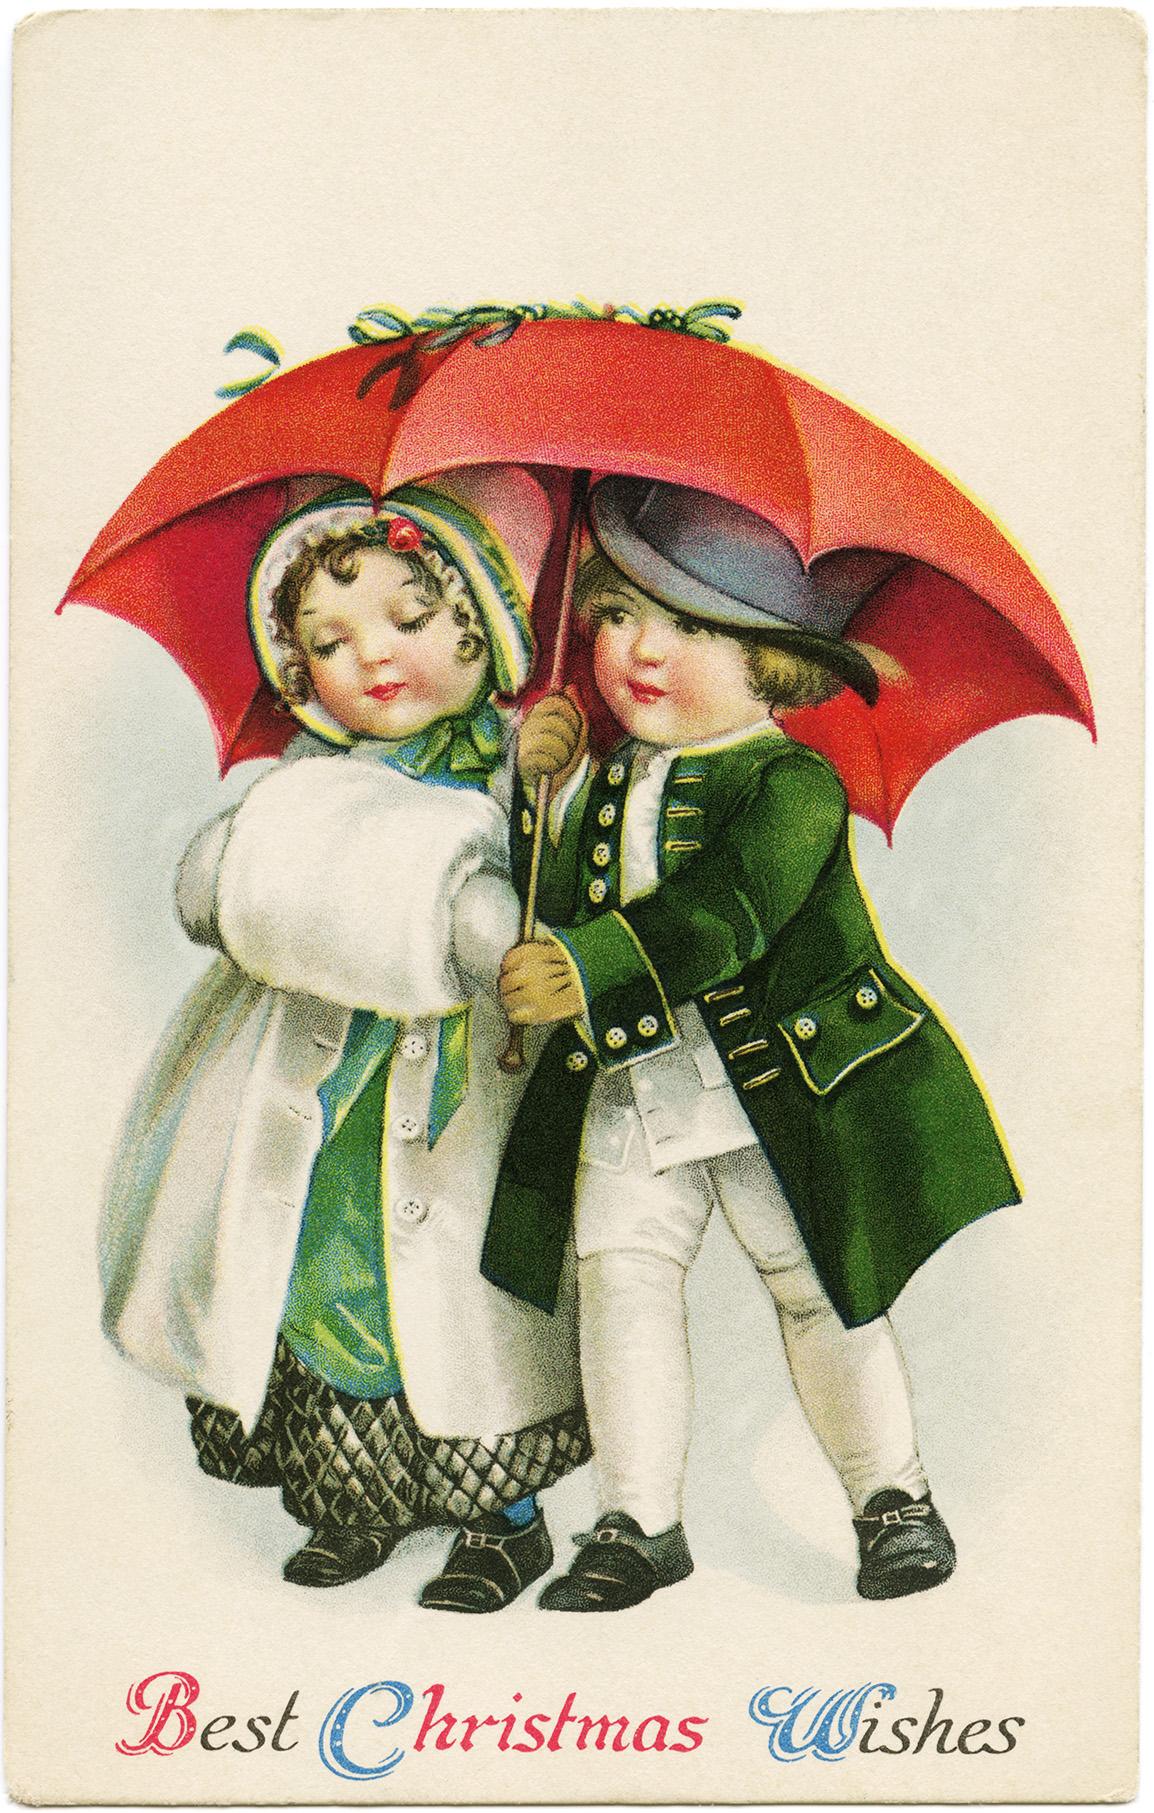 vintage Christmas postcard, victorian boy girl clipart, children walking under umbrella image, old fashioned christmas card, antique digital download postcard